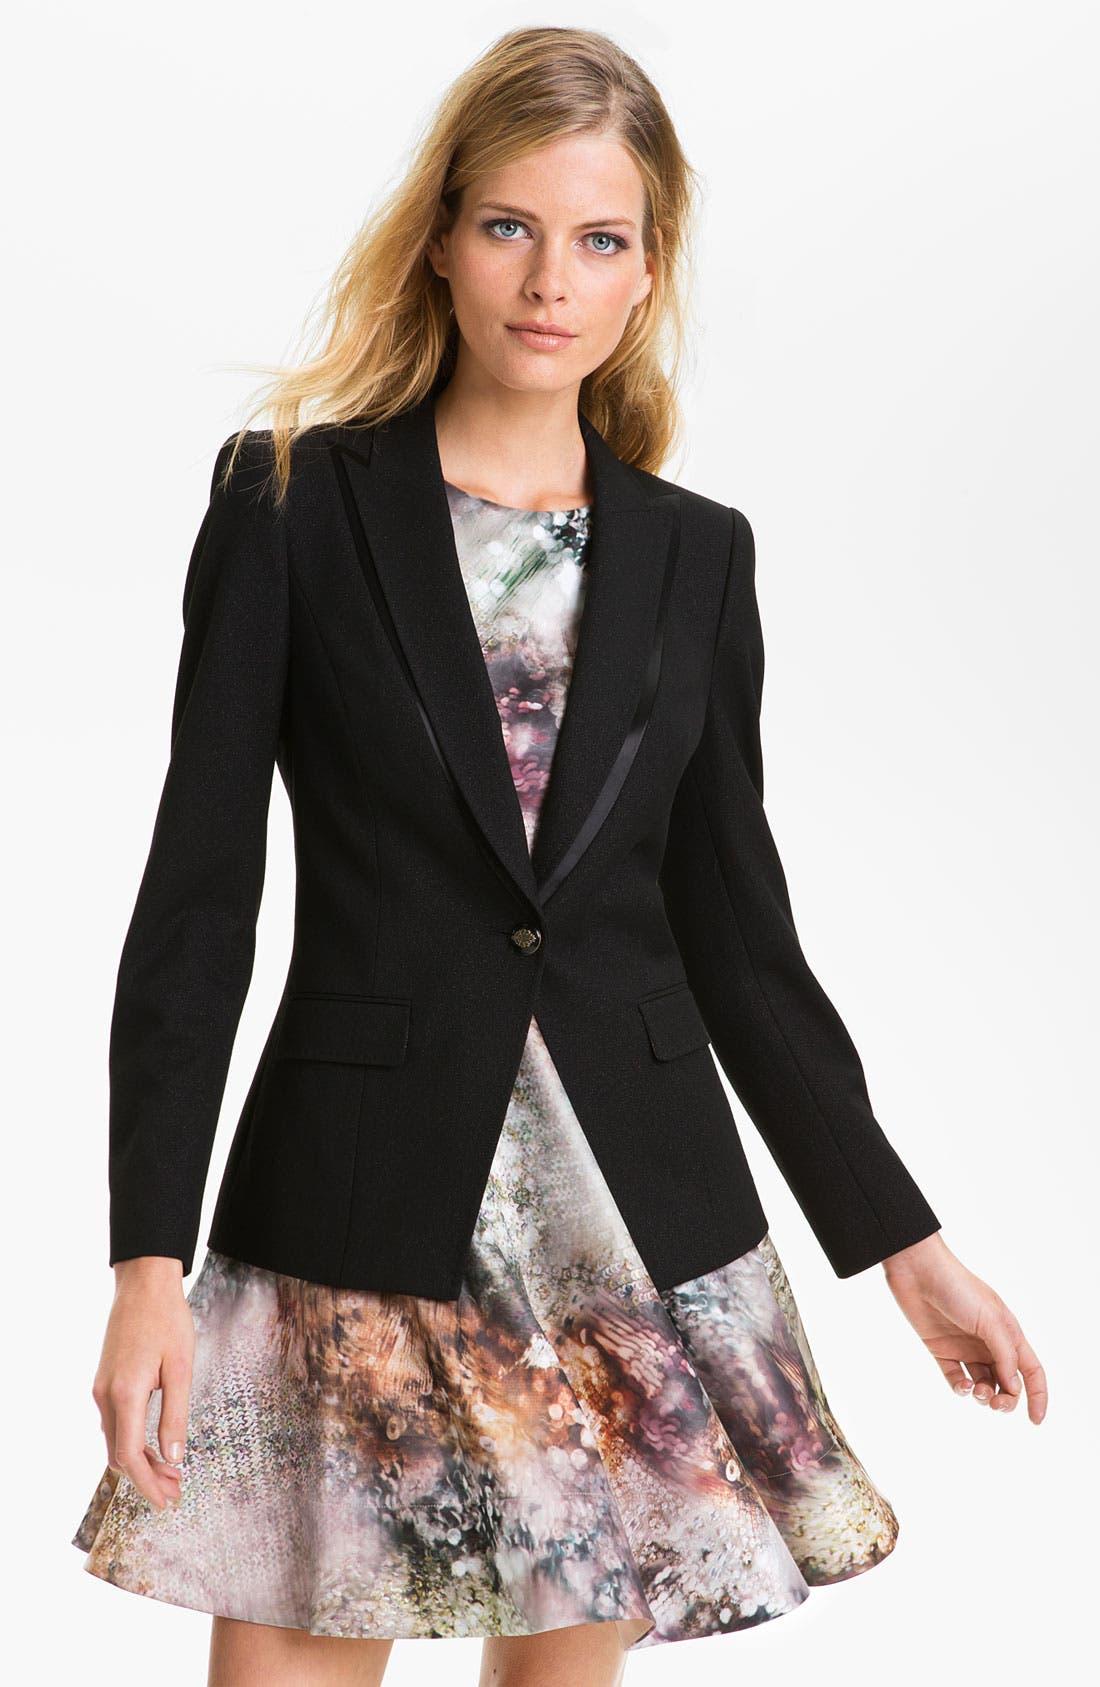 Alternate Image 1 Selected - Ted Baker London 'Mowna' Suit Blazer